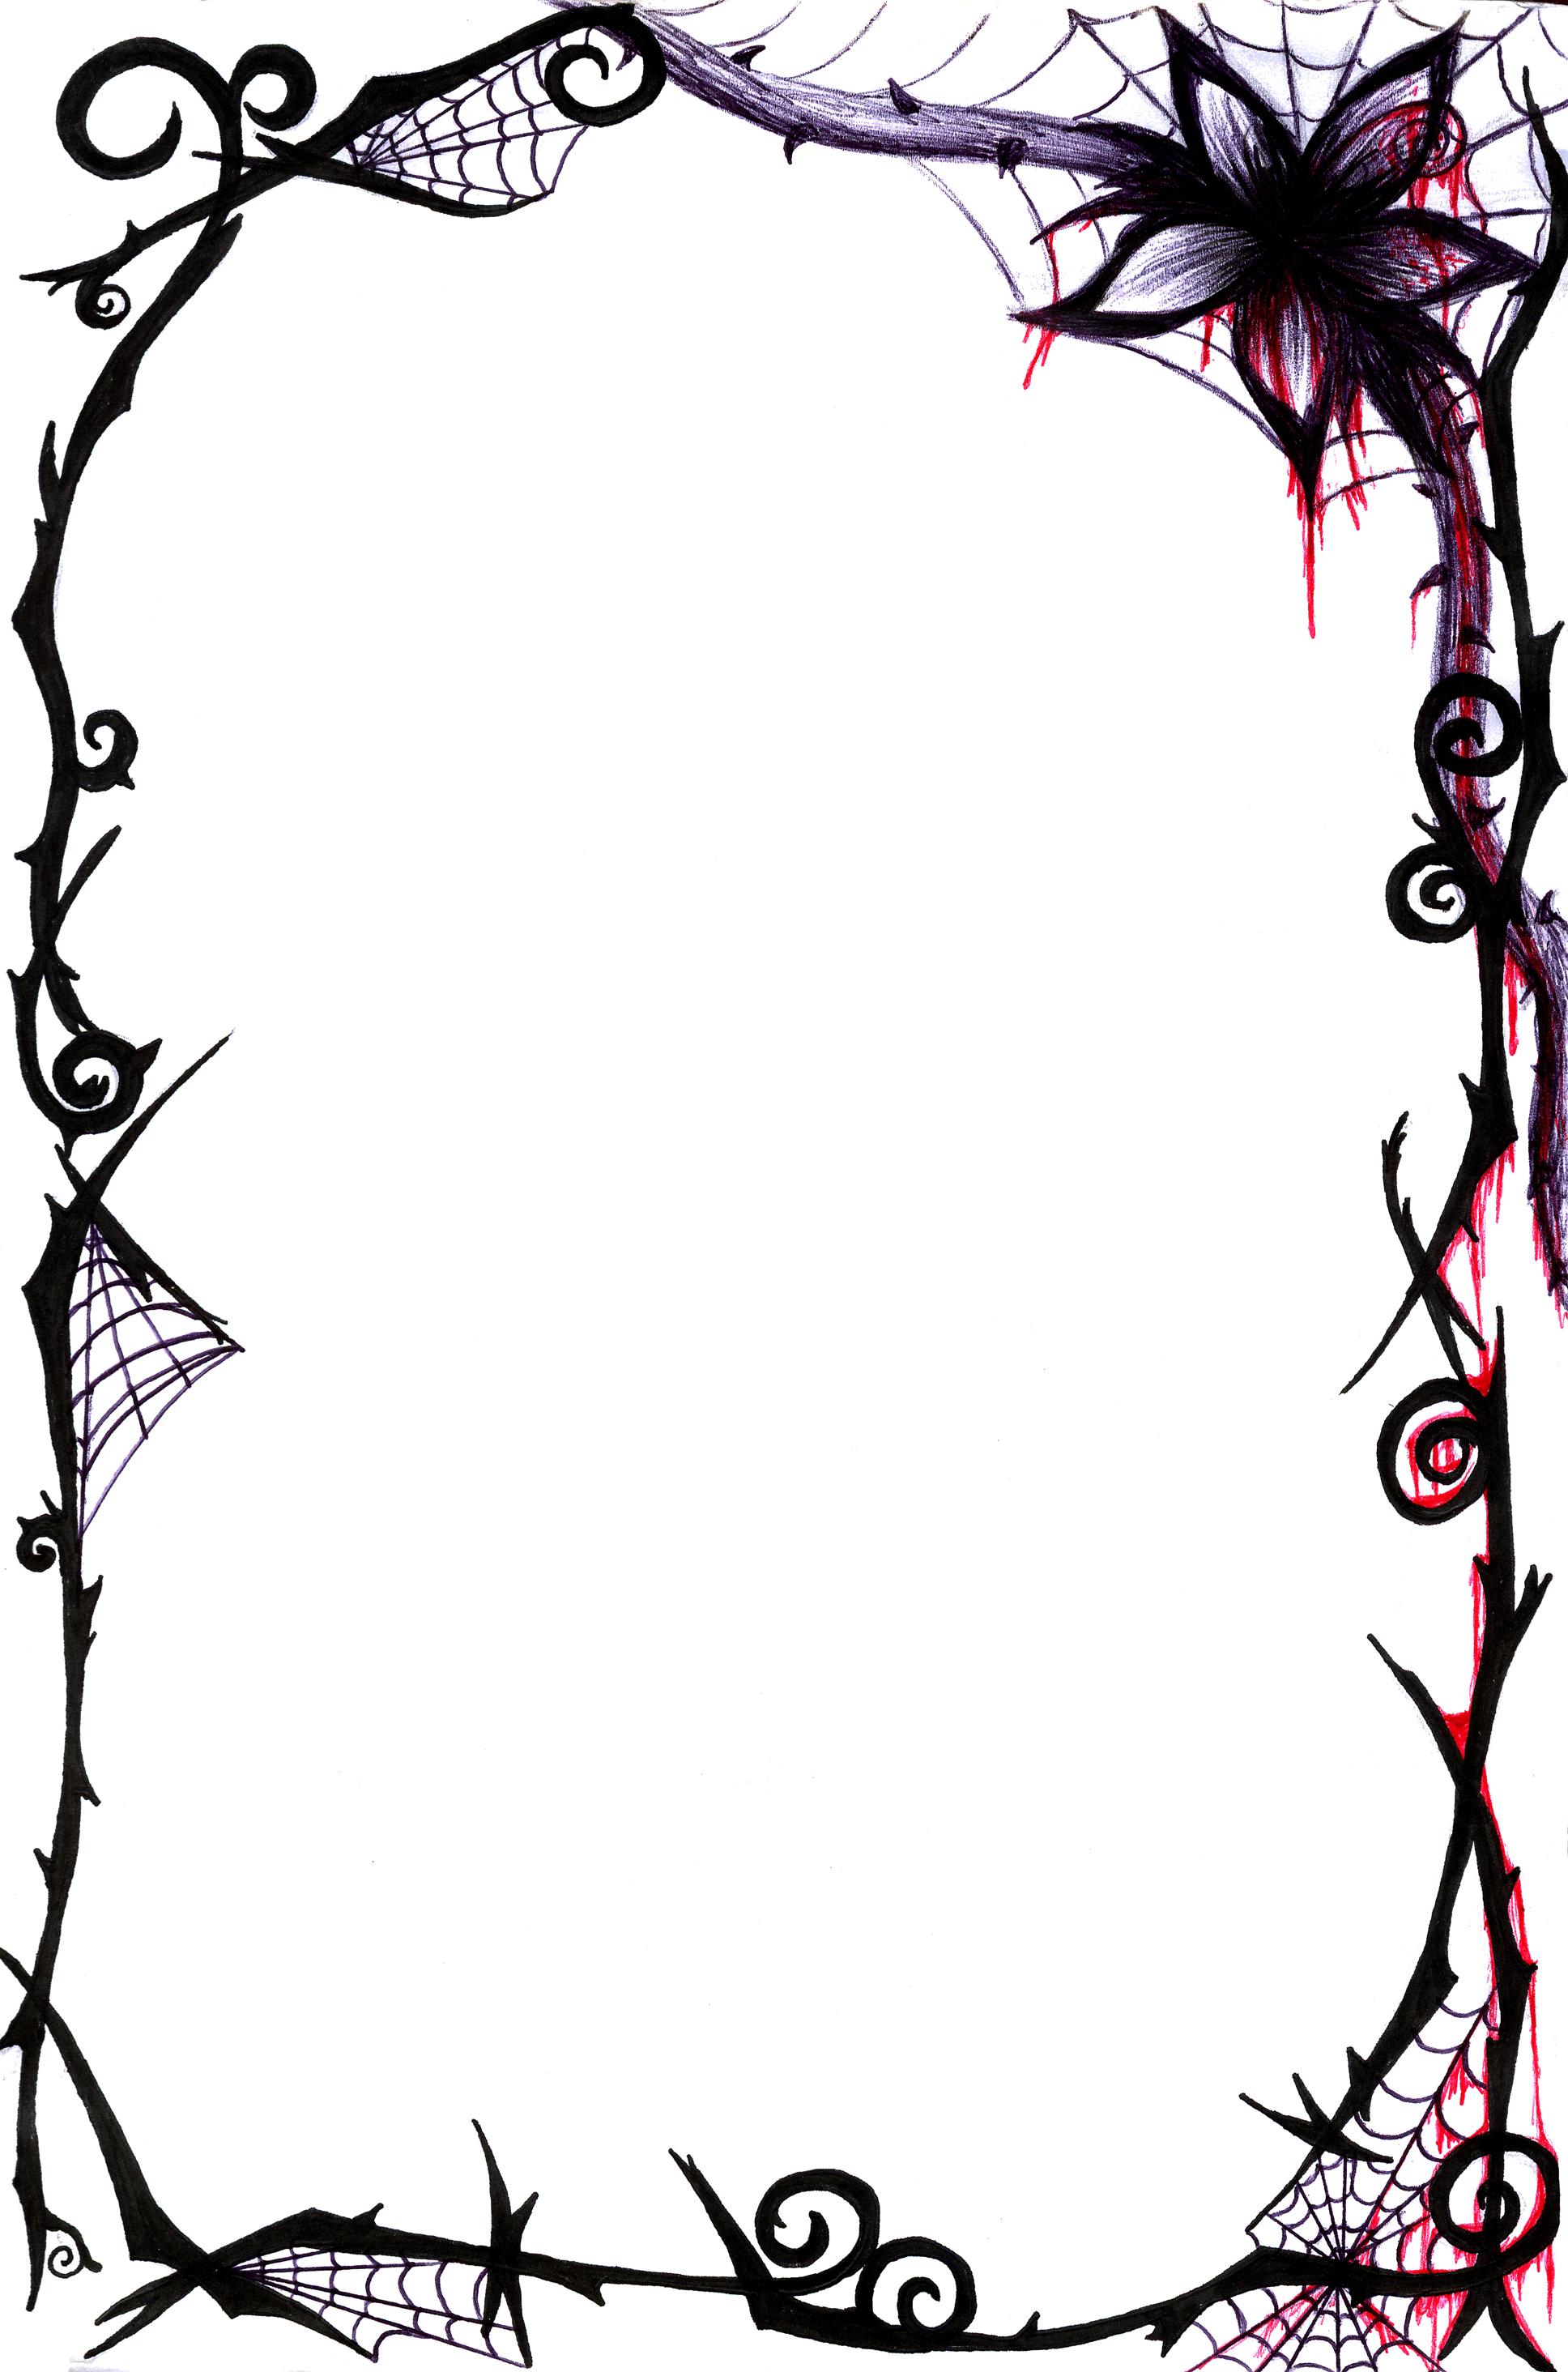 +border design+ by SiNrott on DeviantArt